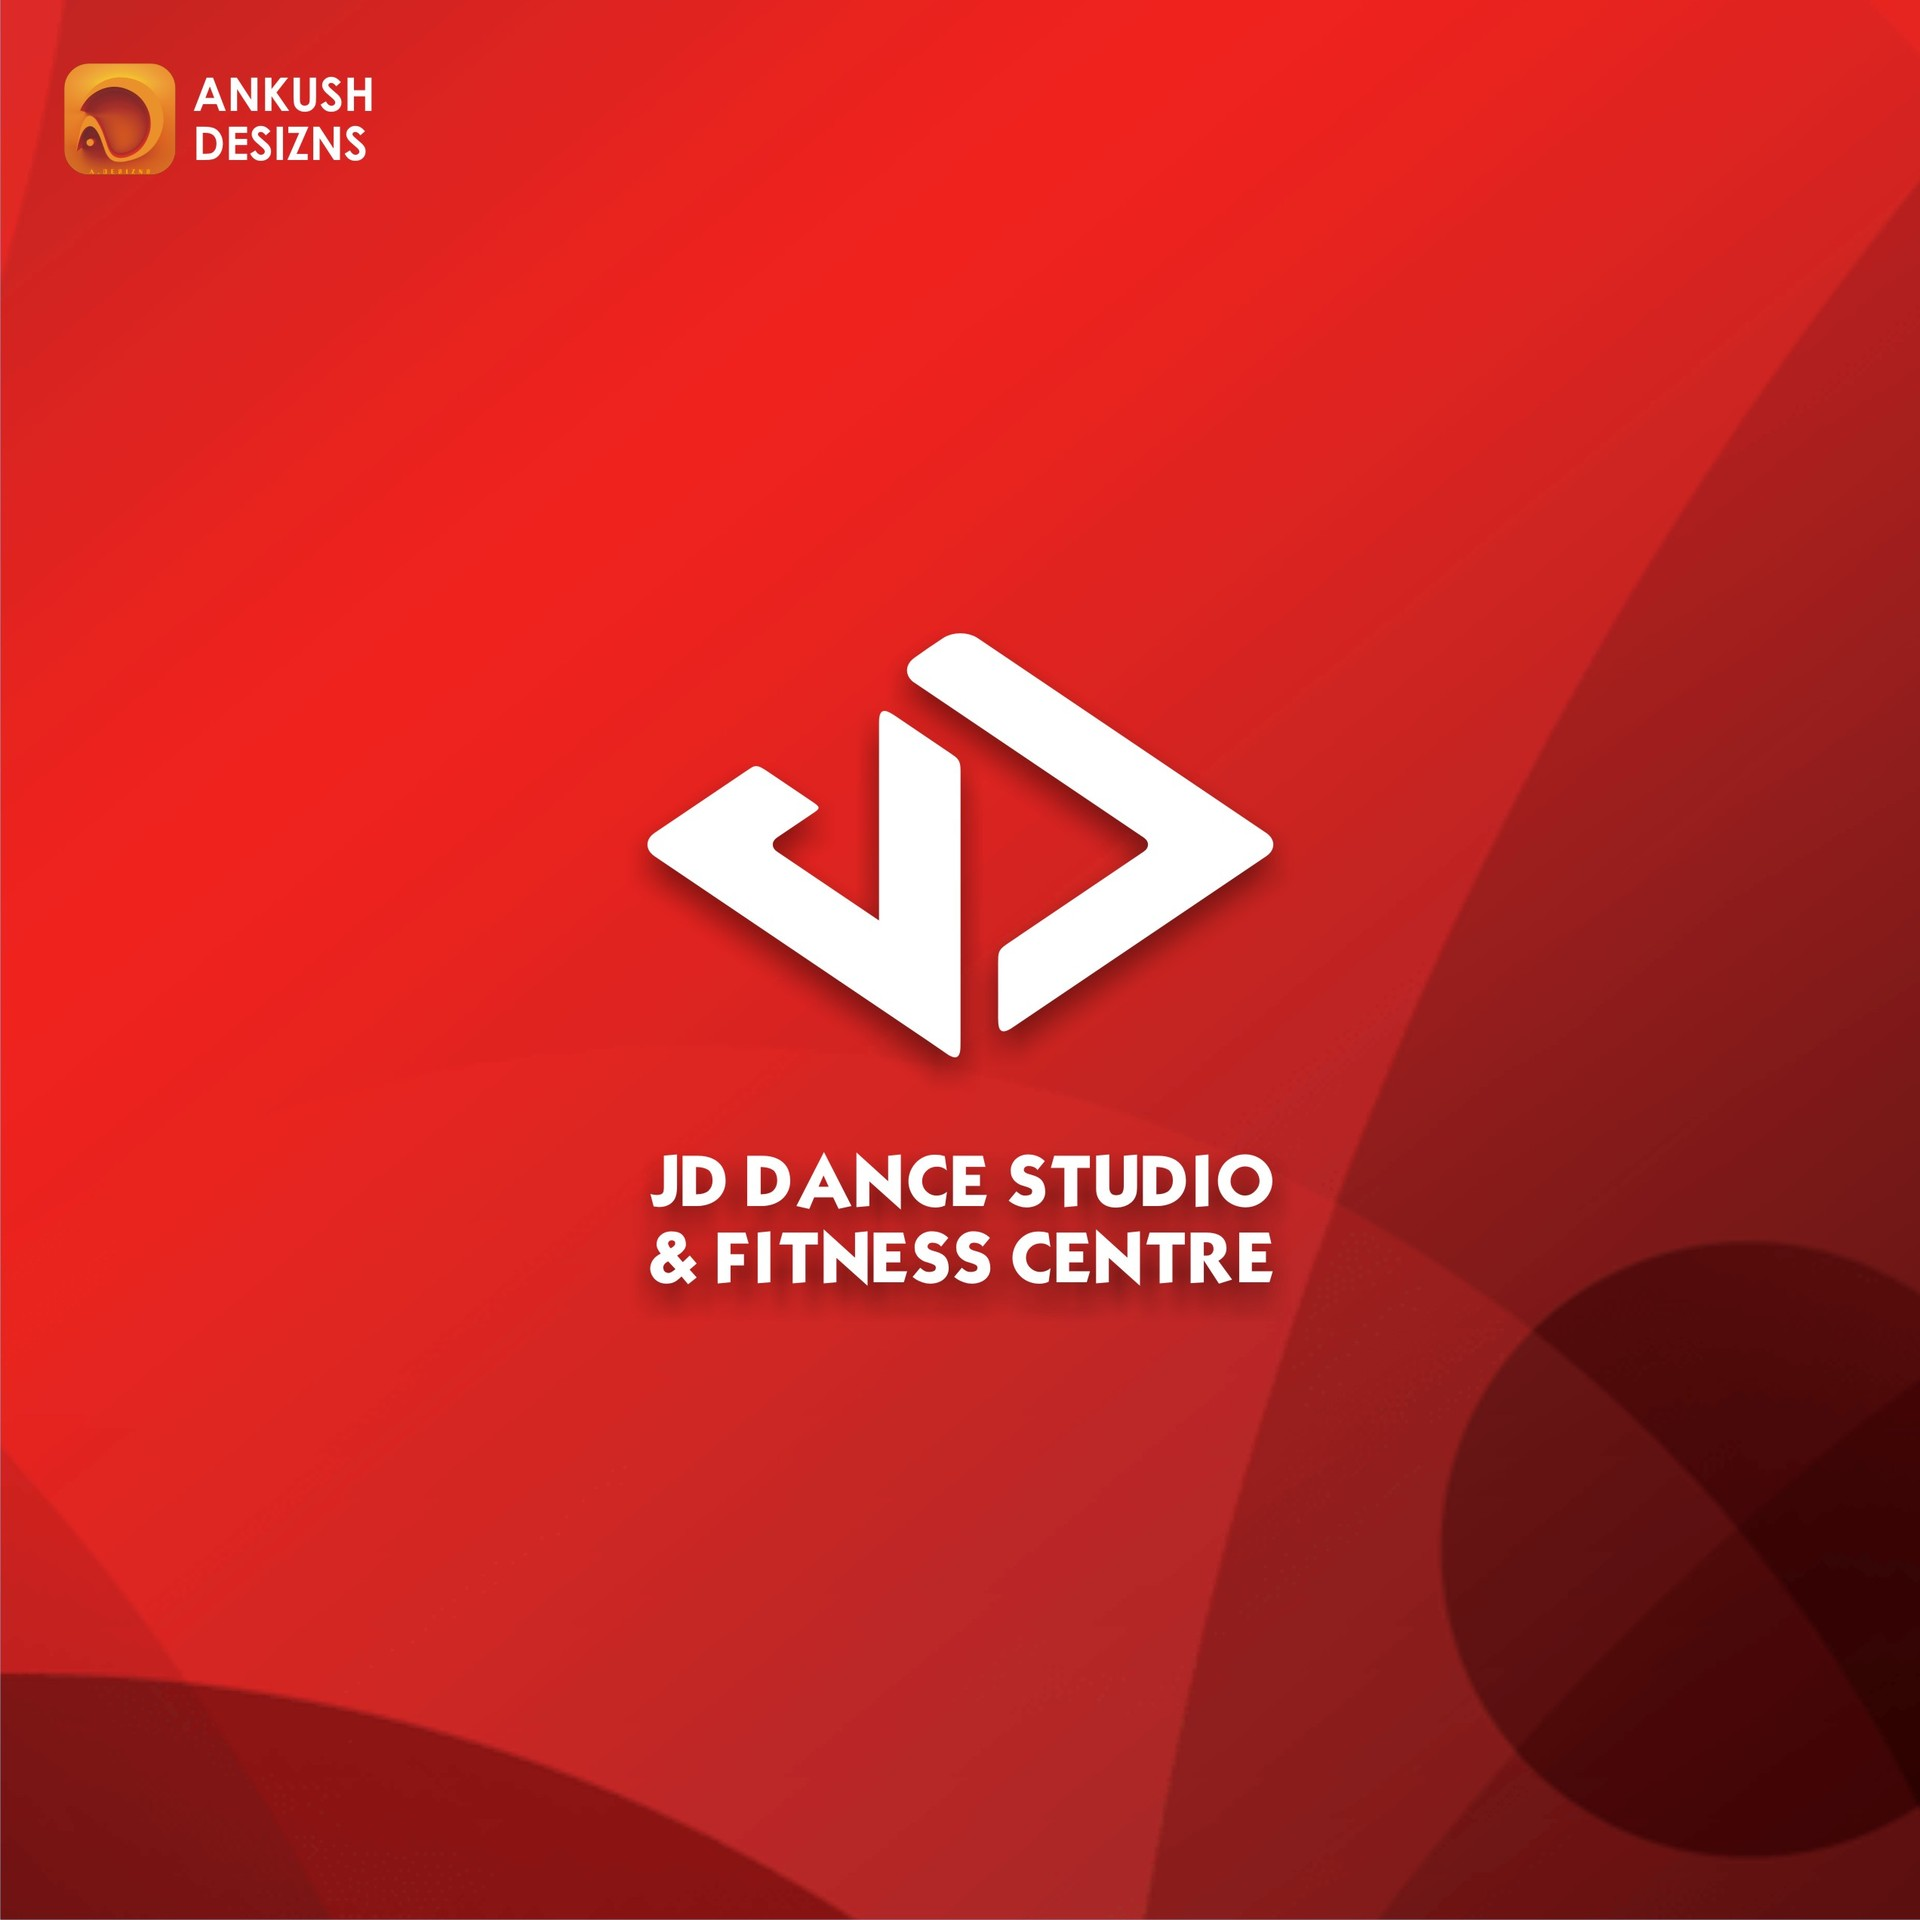 artstation jd dance studio ankush desizns studio jd dance studio ankush desizns studio